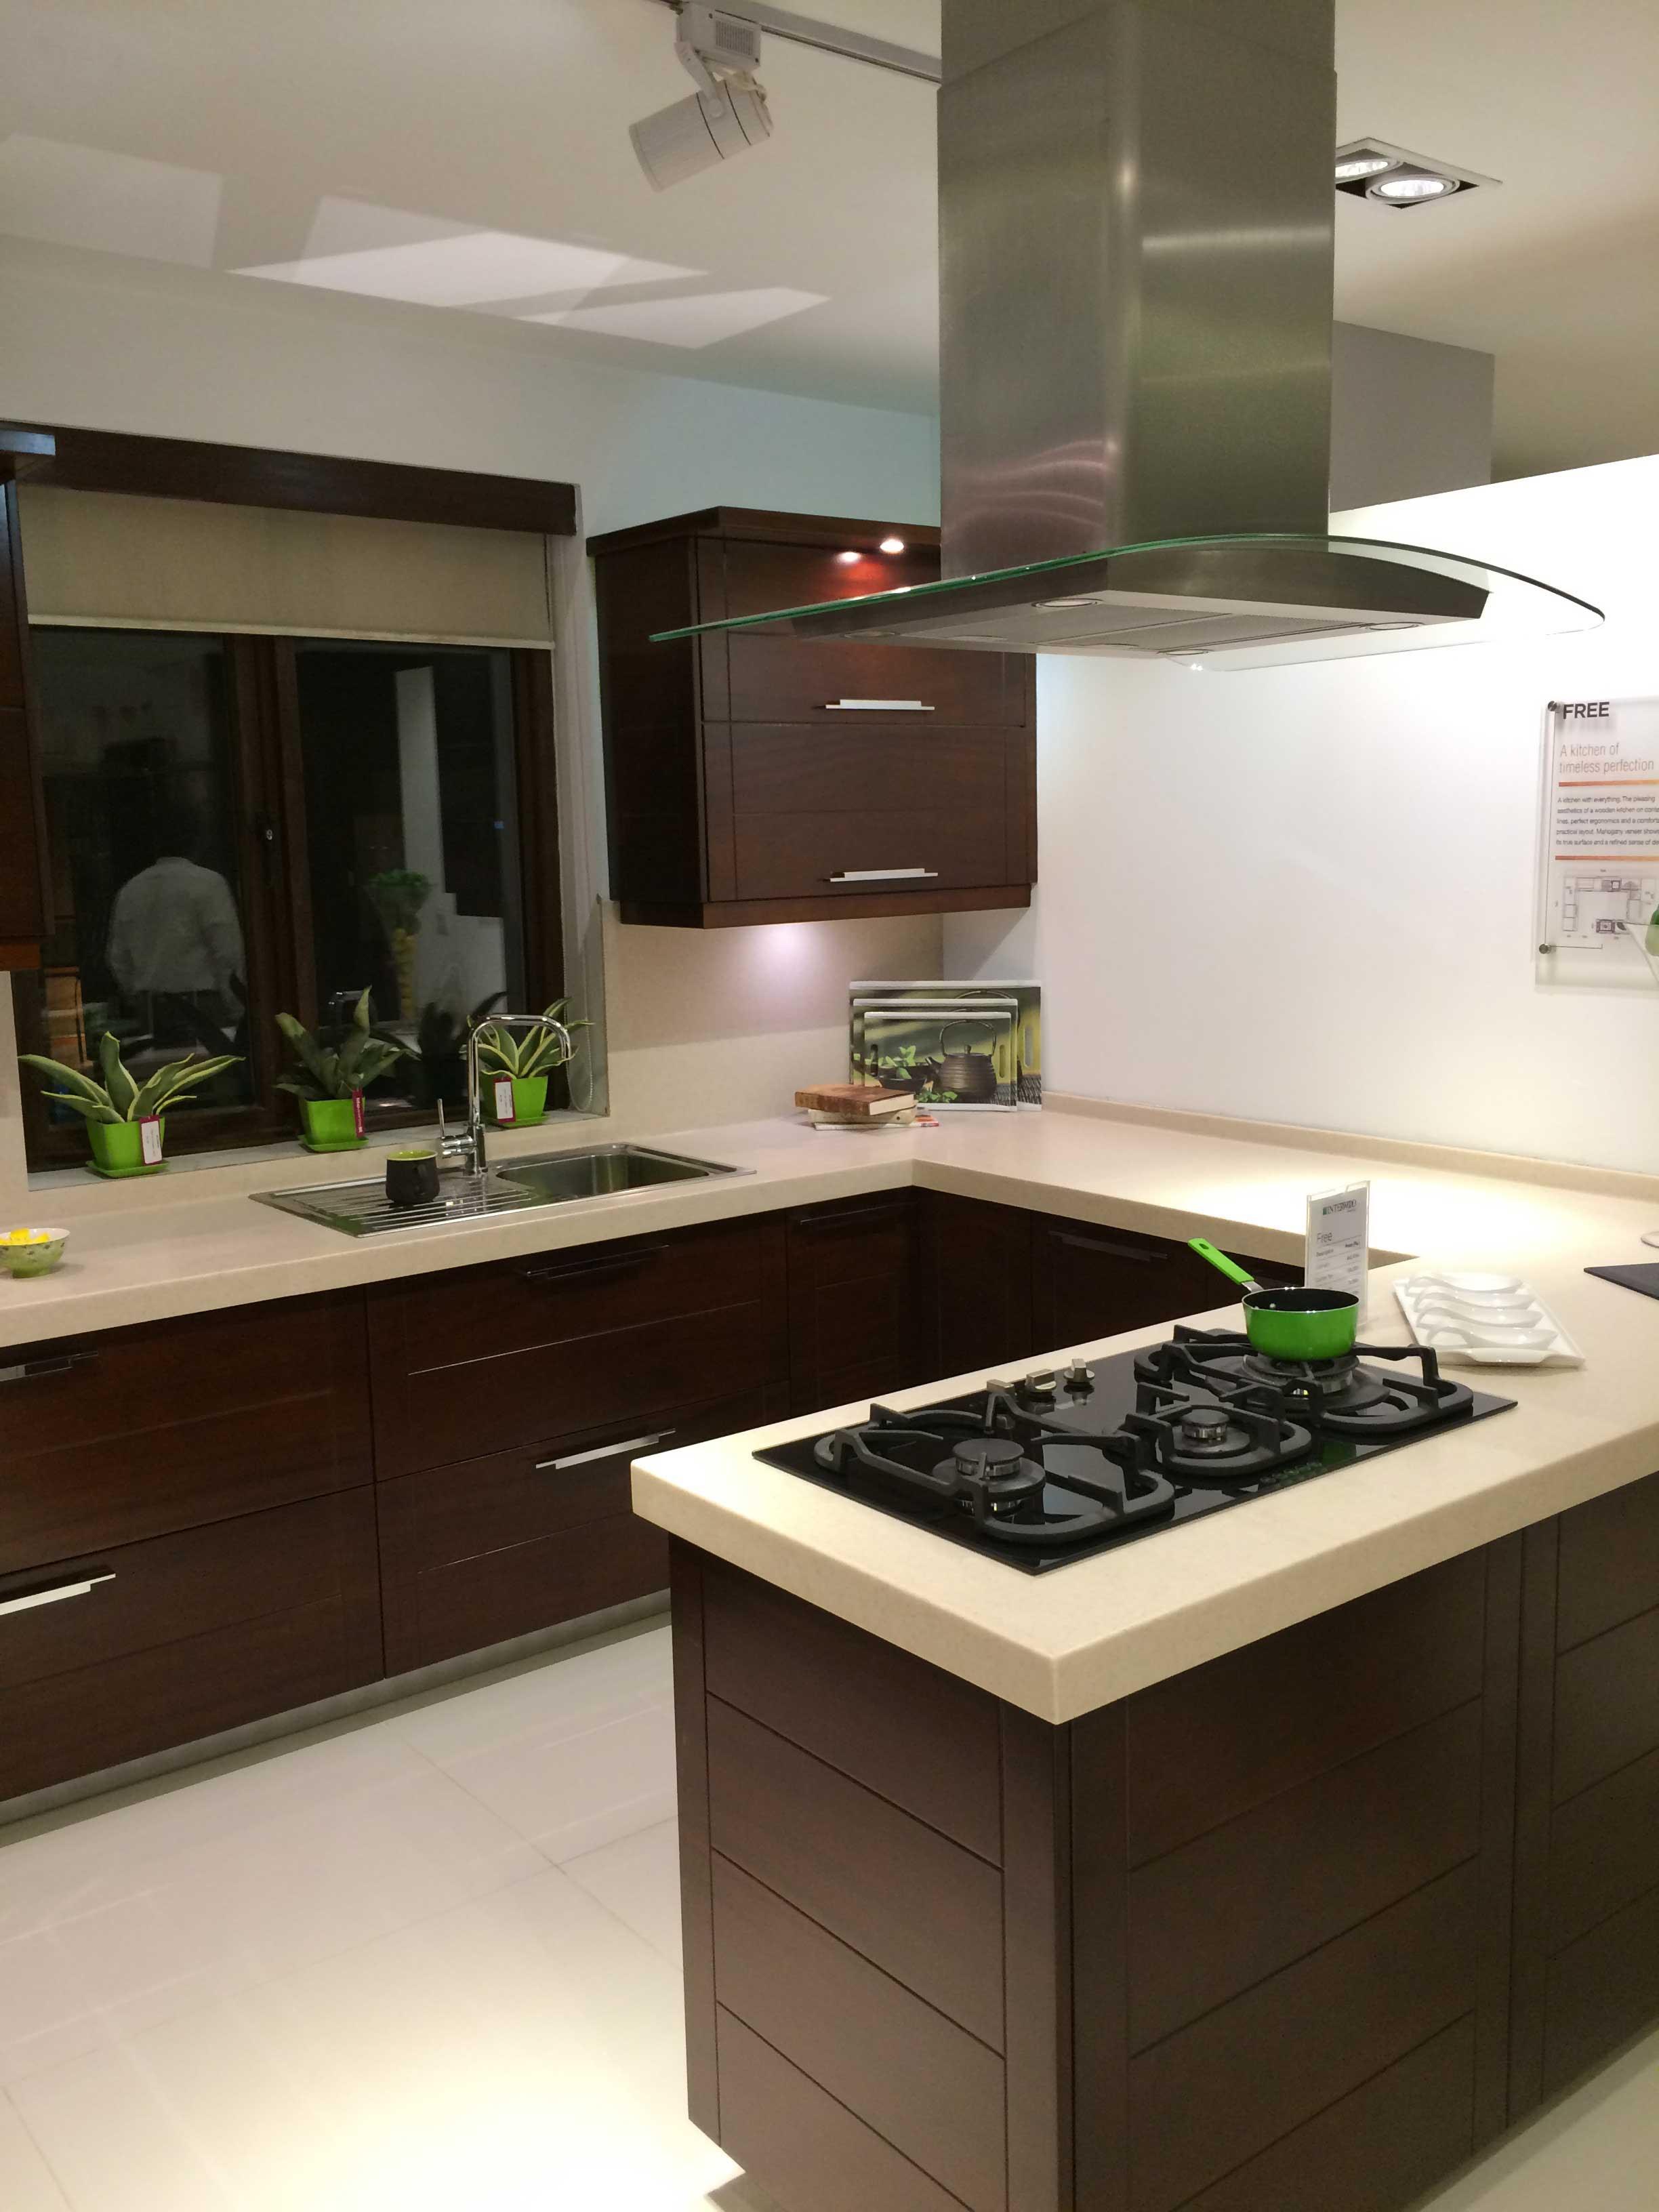 Interwood designer Kitchen Pakistan - 18 - Karachista ...